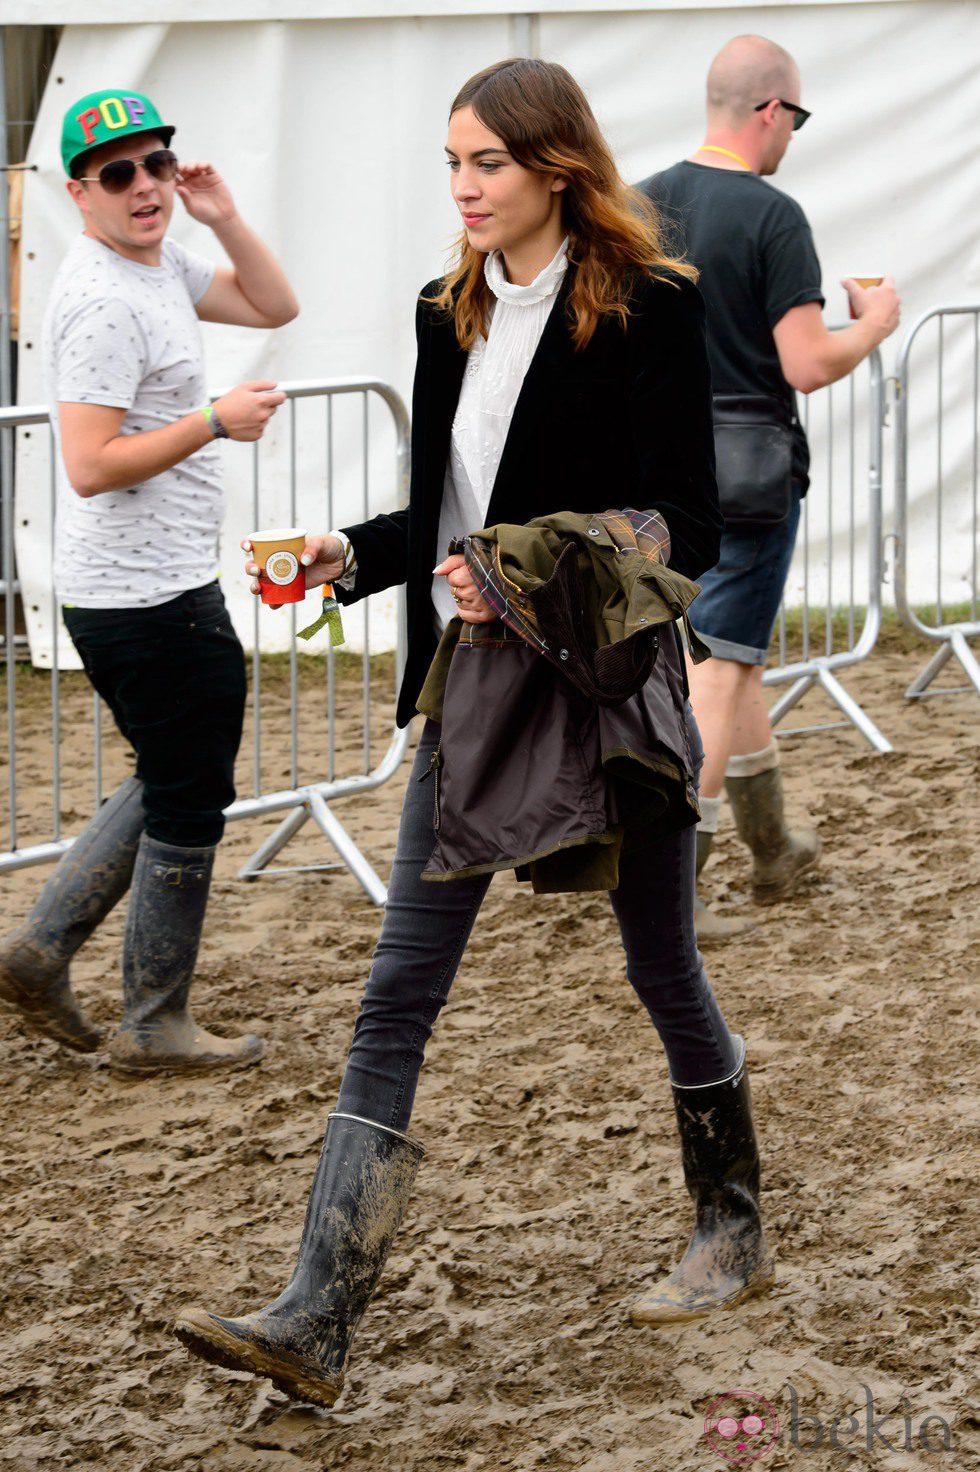 Alexa Chung en el Festival de Glastonbury 2014